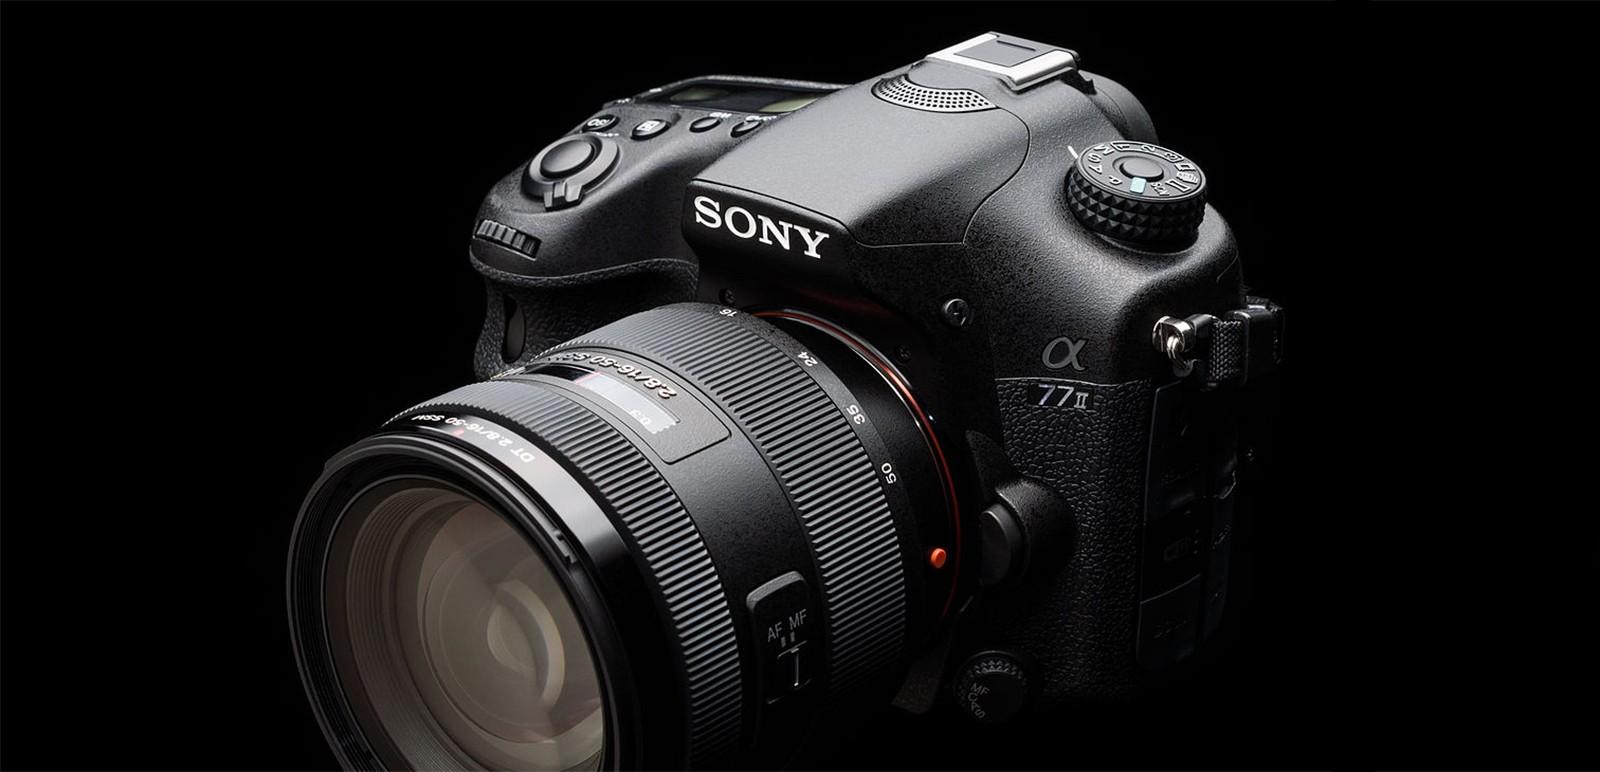 Sony Alpha A77 Mark II